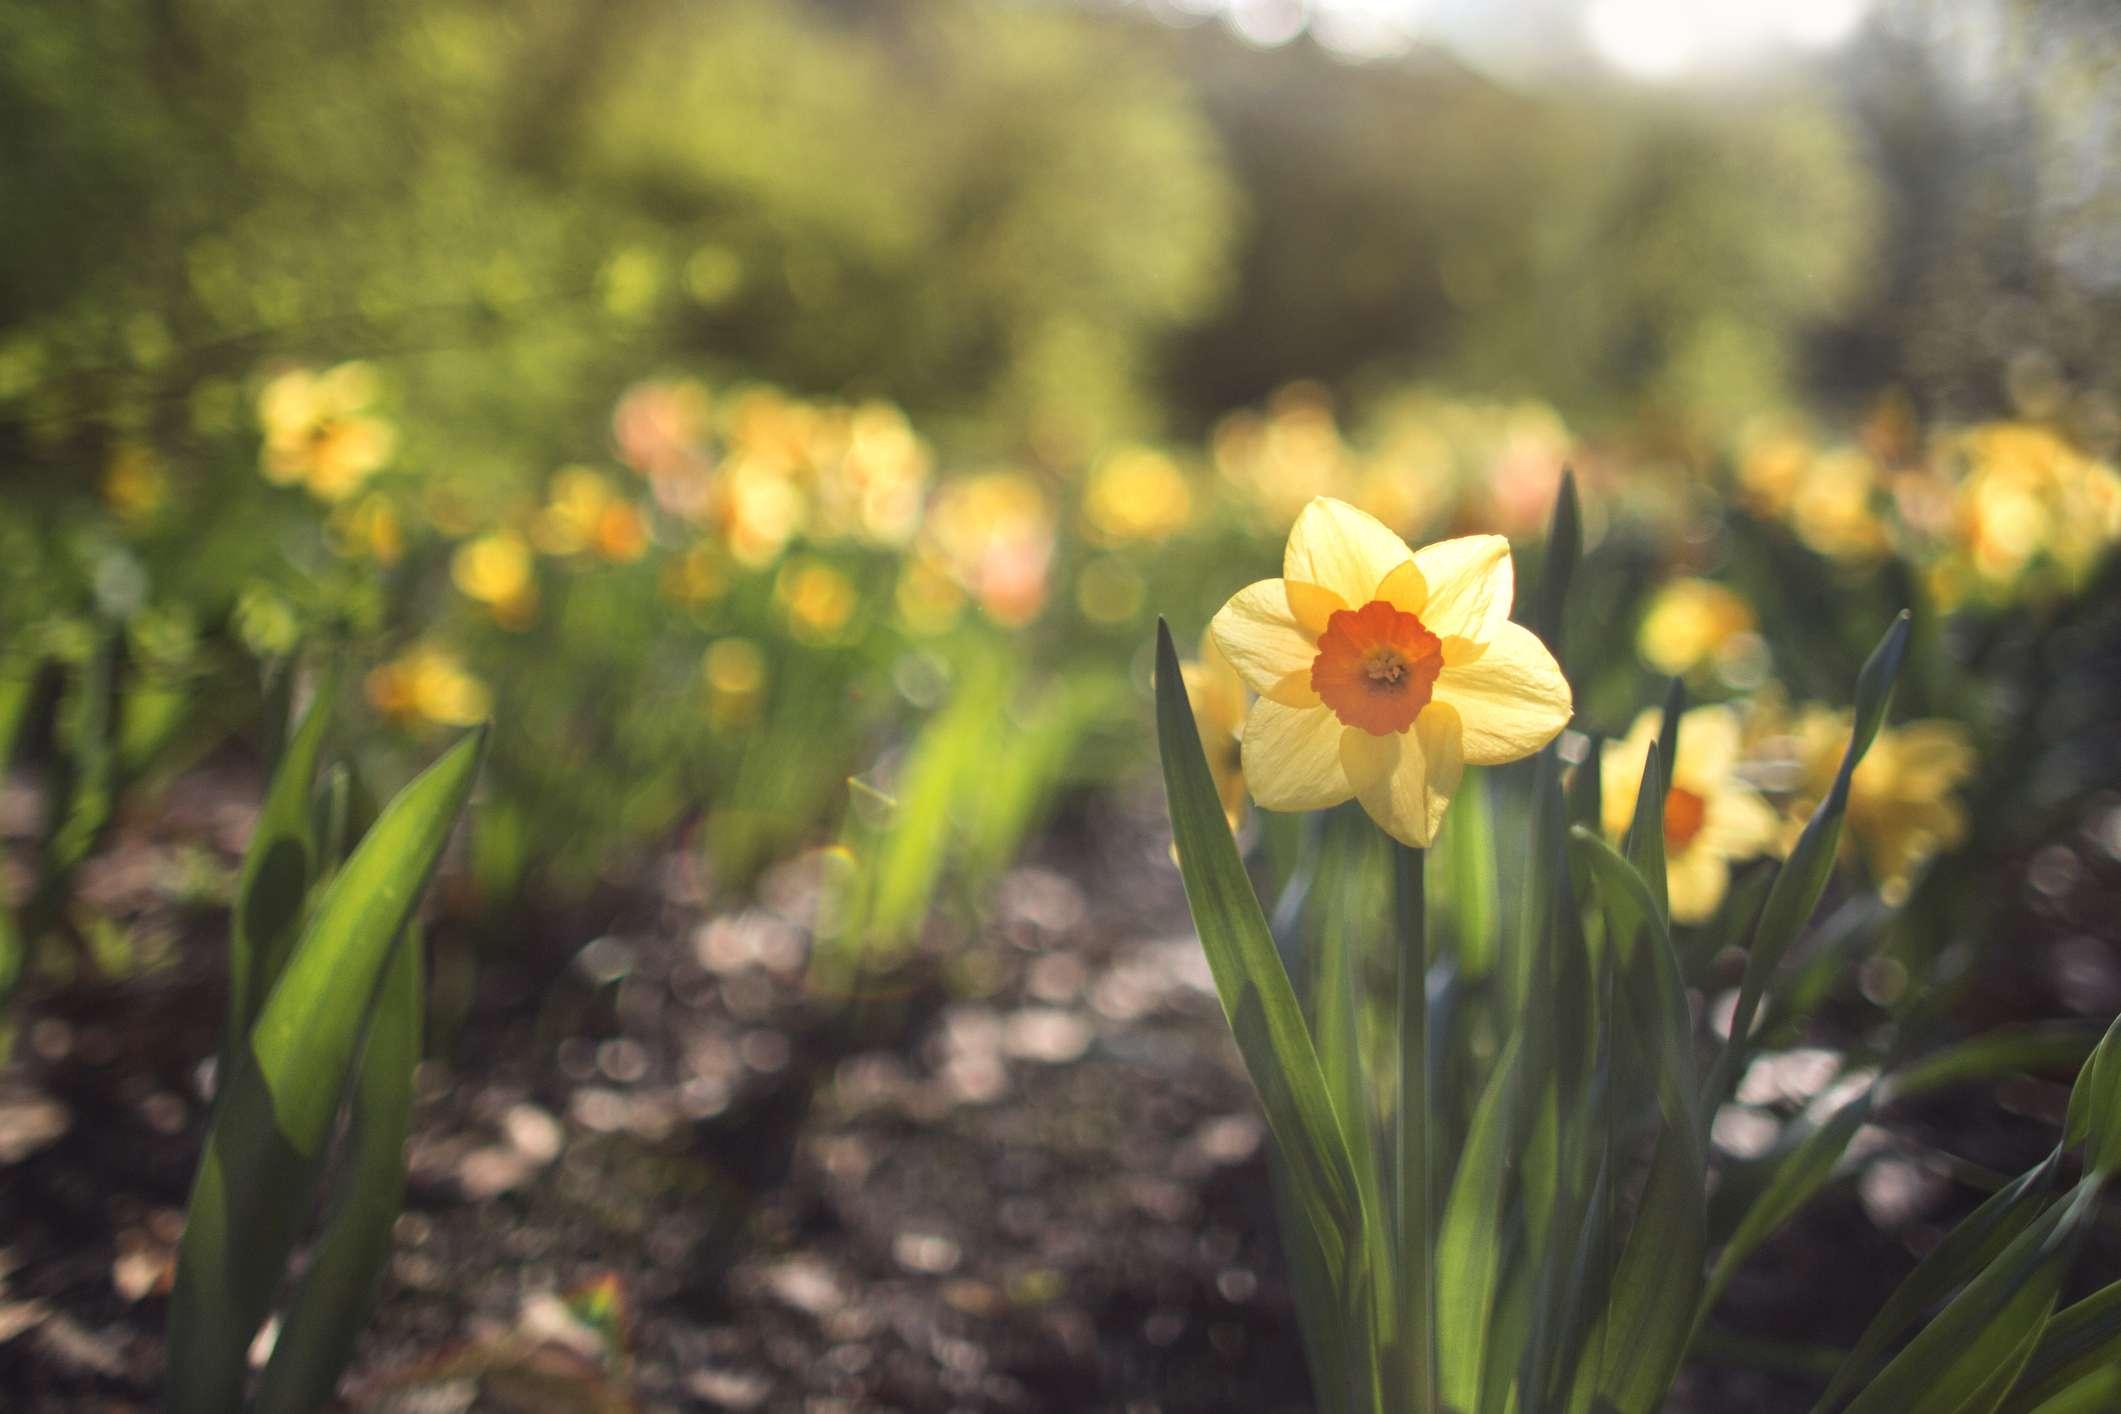 Daffodil growing in a spring garden